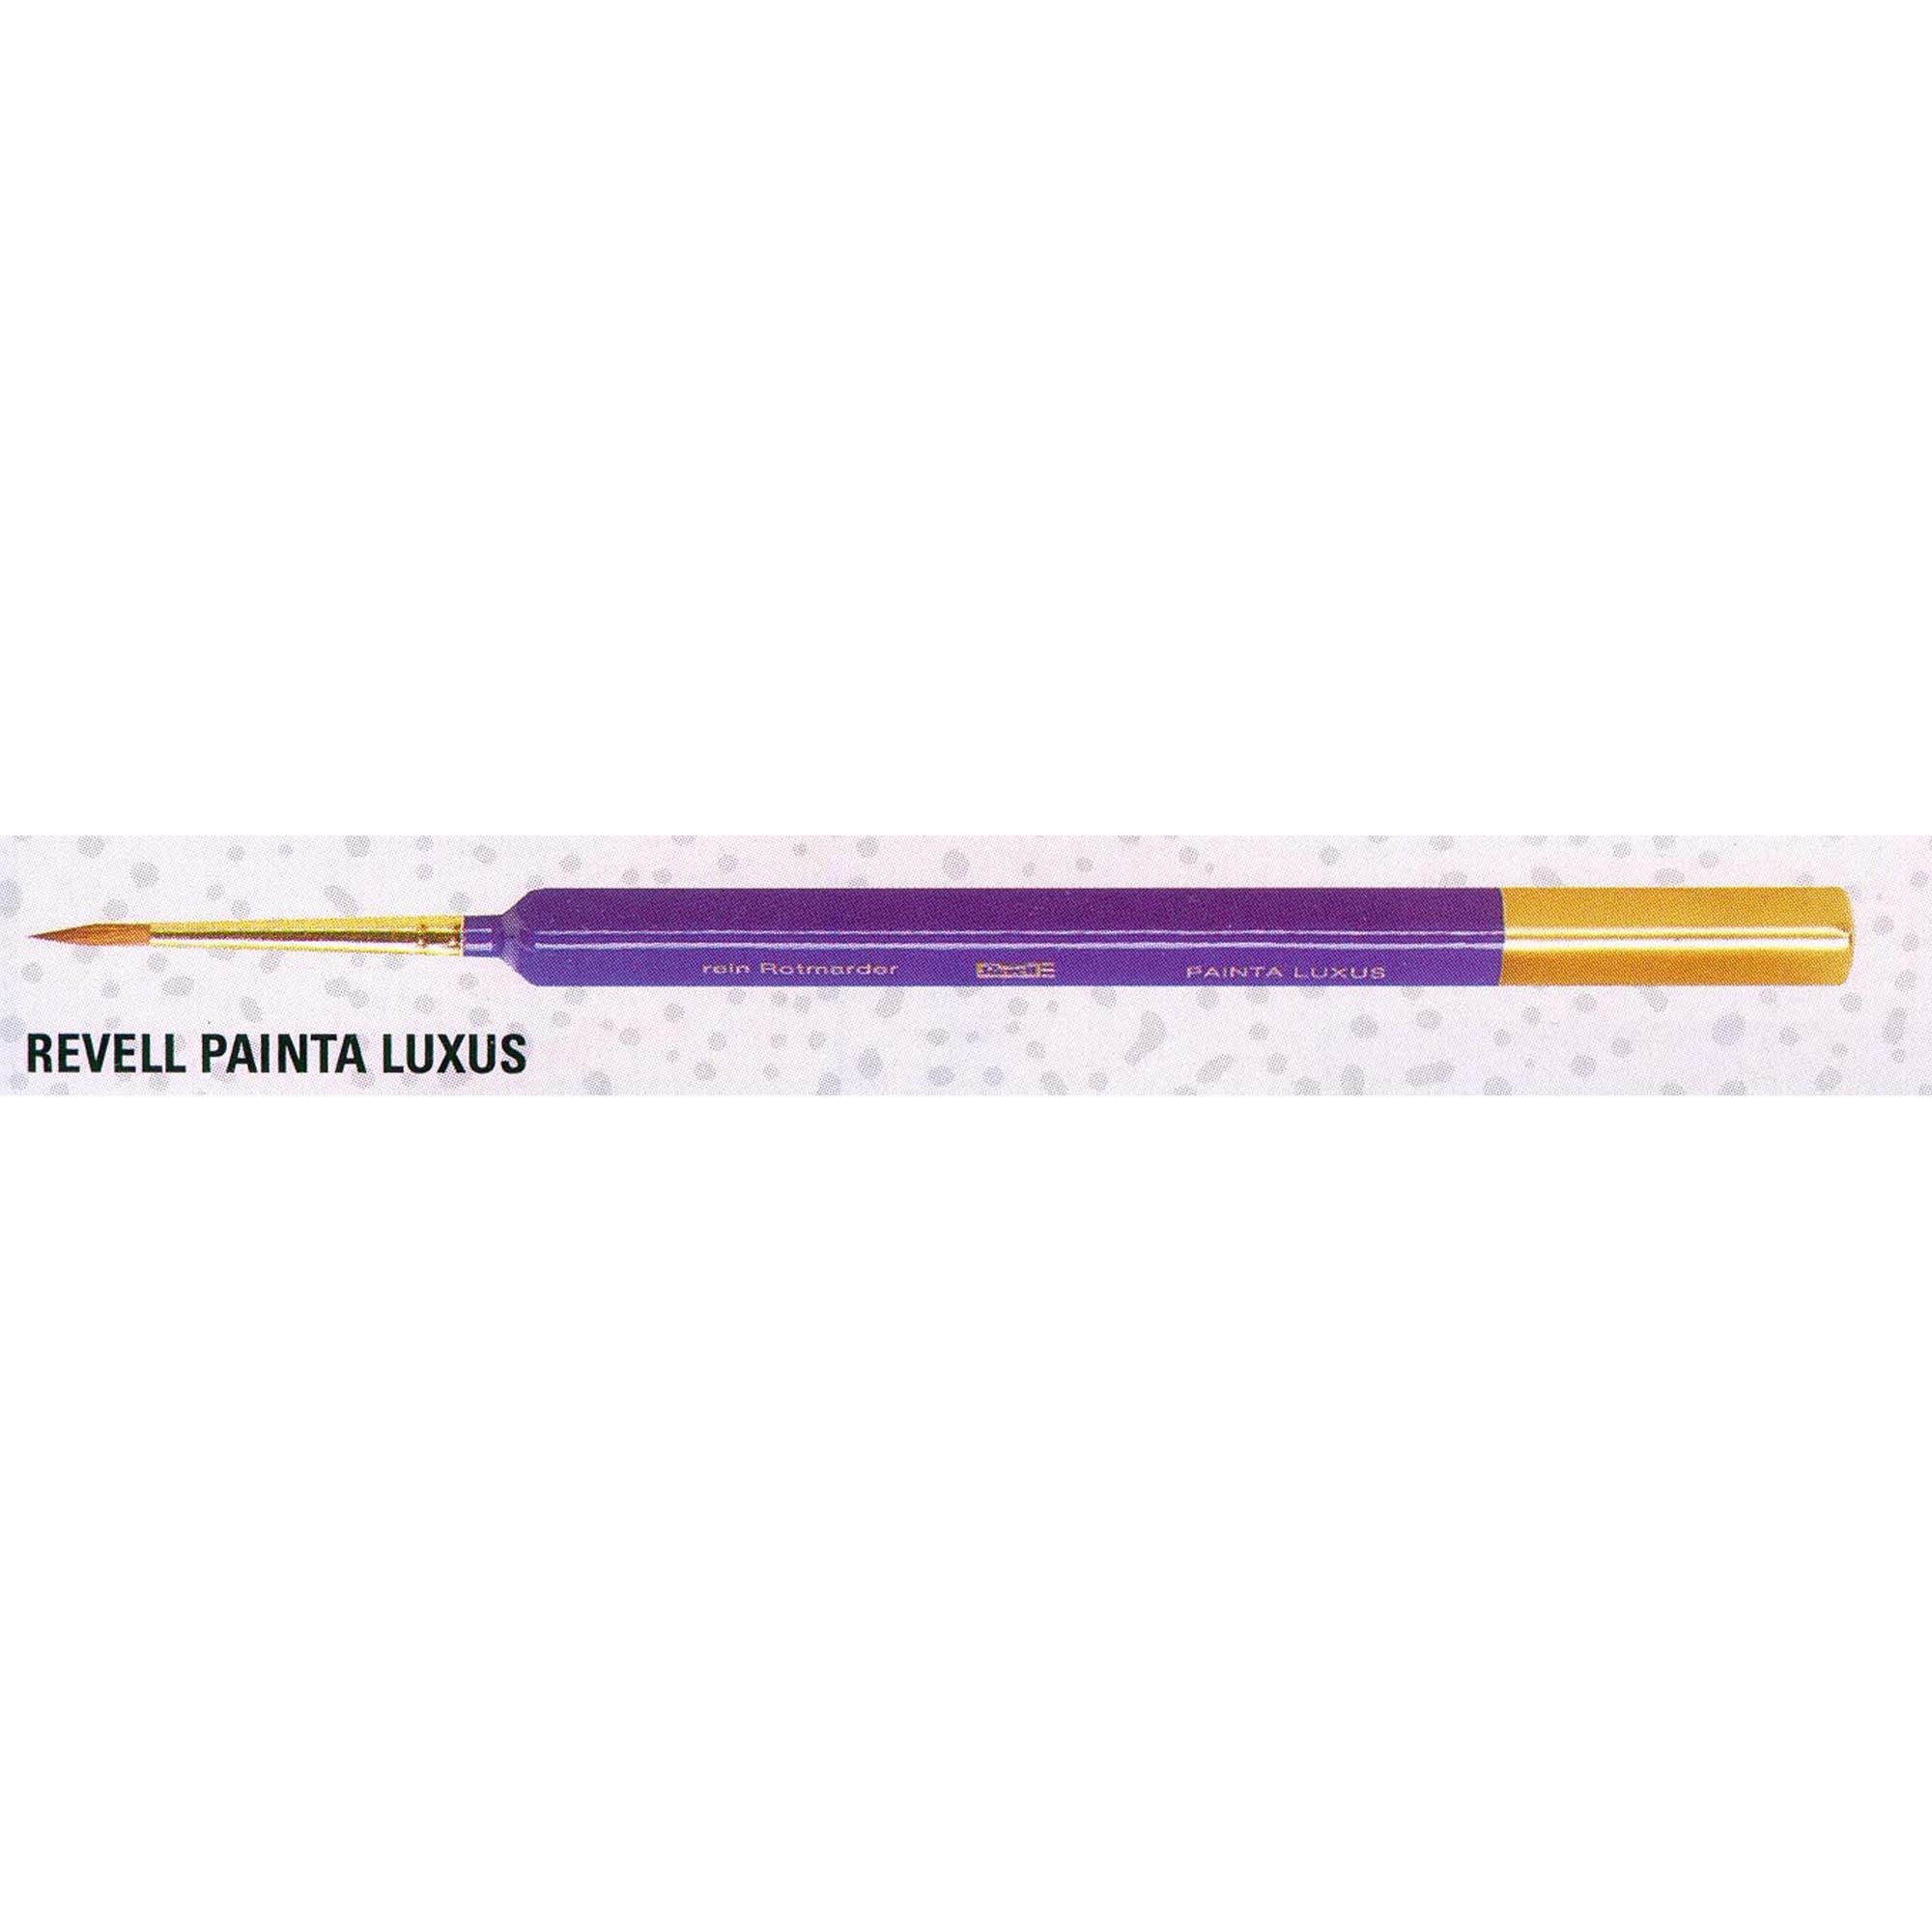 Revell Pinsel Painta Luxus 3/0